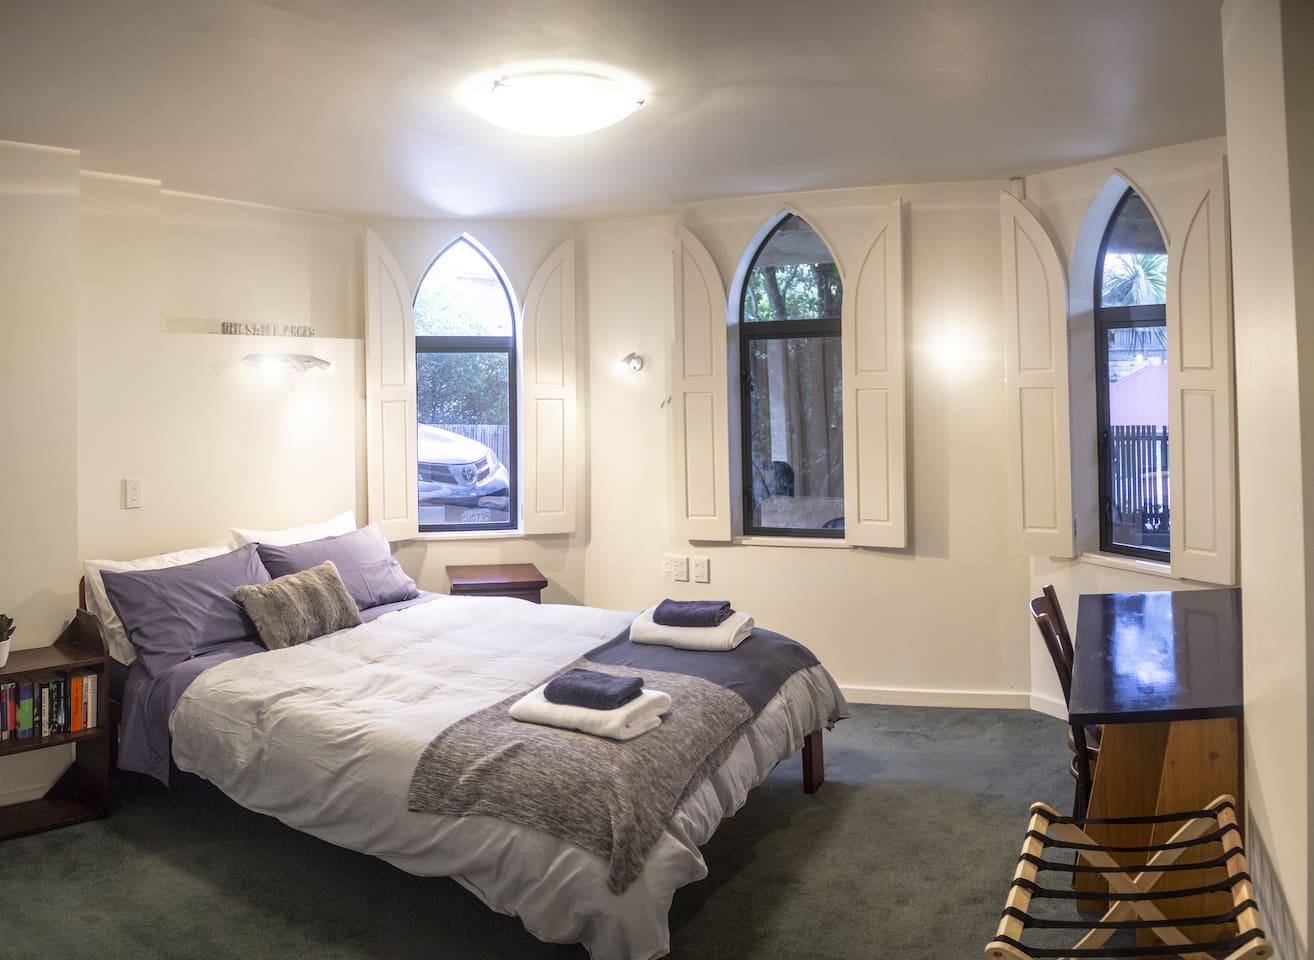 Spacious stylish bedroom